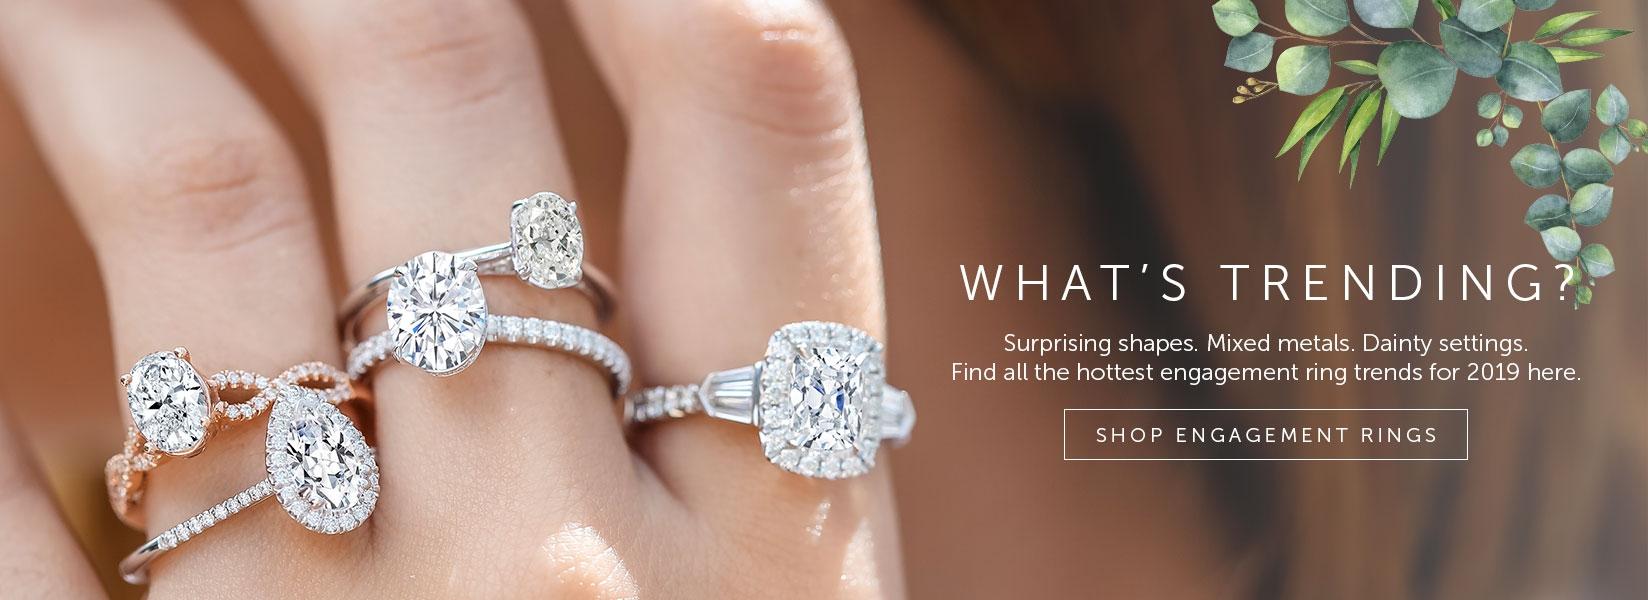 Shop for Princess Cut Engagement Rings